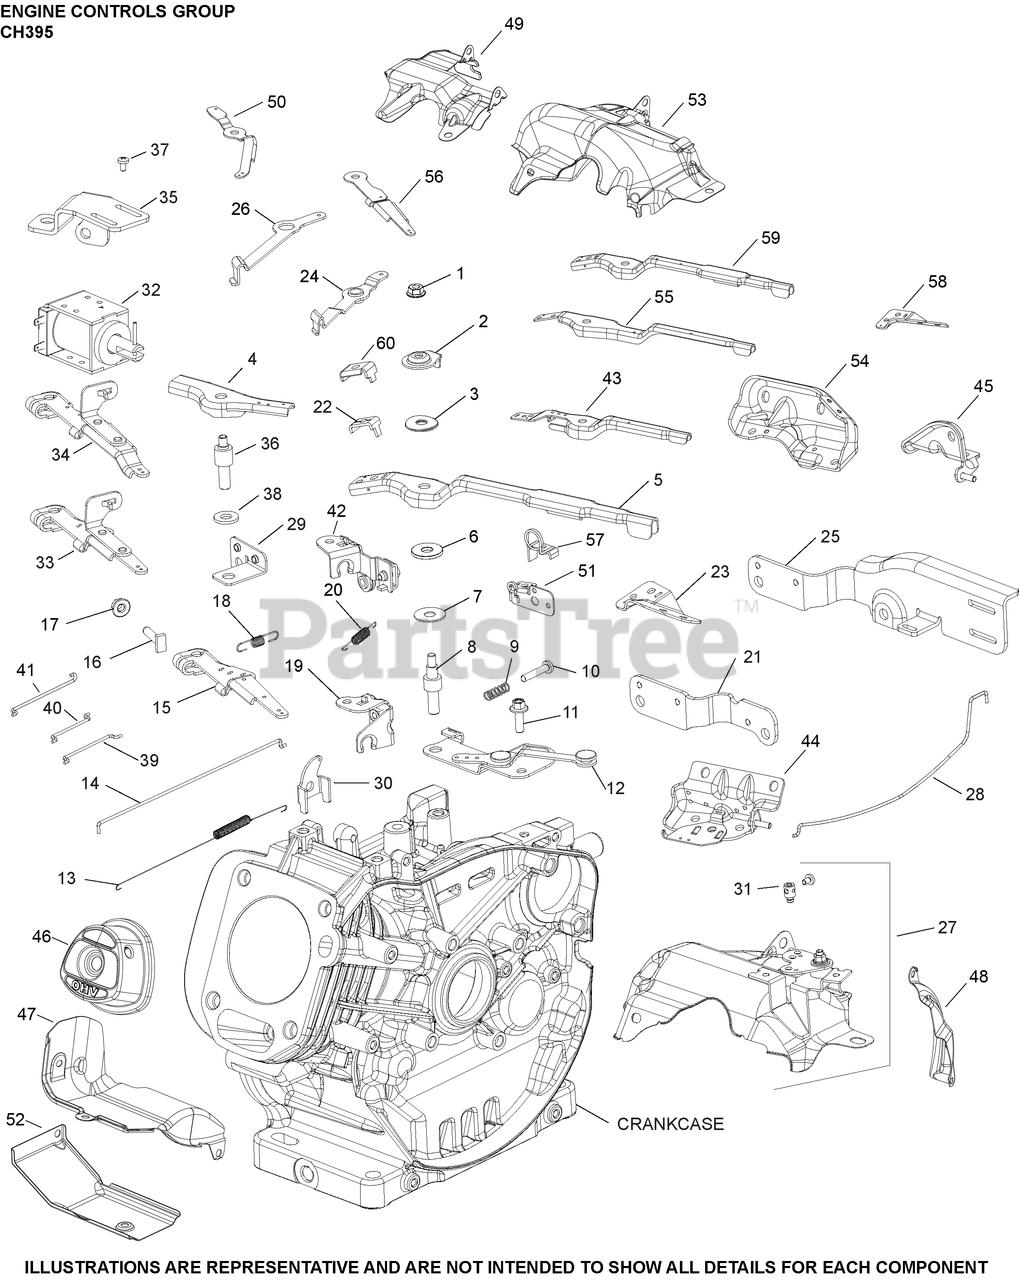 1 2 Hp Kohler Engine Parts Diagram Easy Light Fixture Wiring Diagrams Electrical Wiring 2010menanti Jeanjaures37 Fr